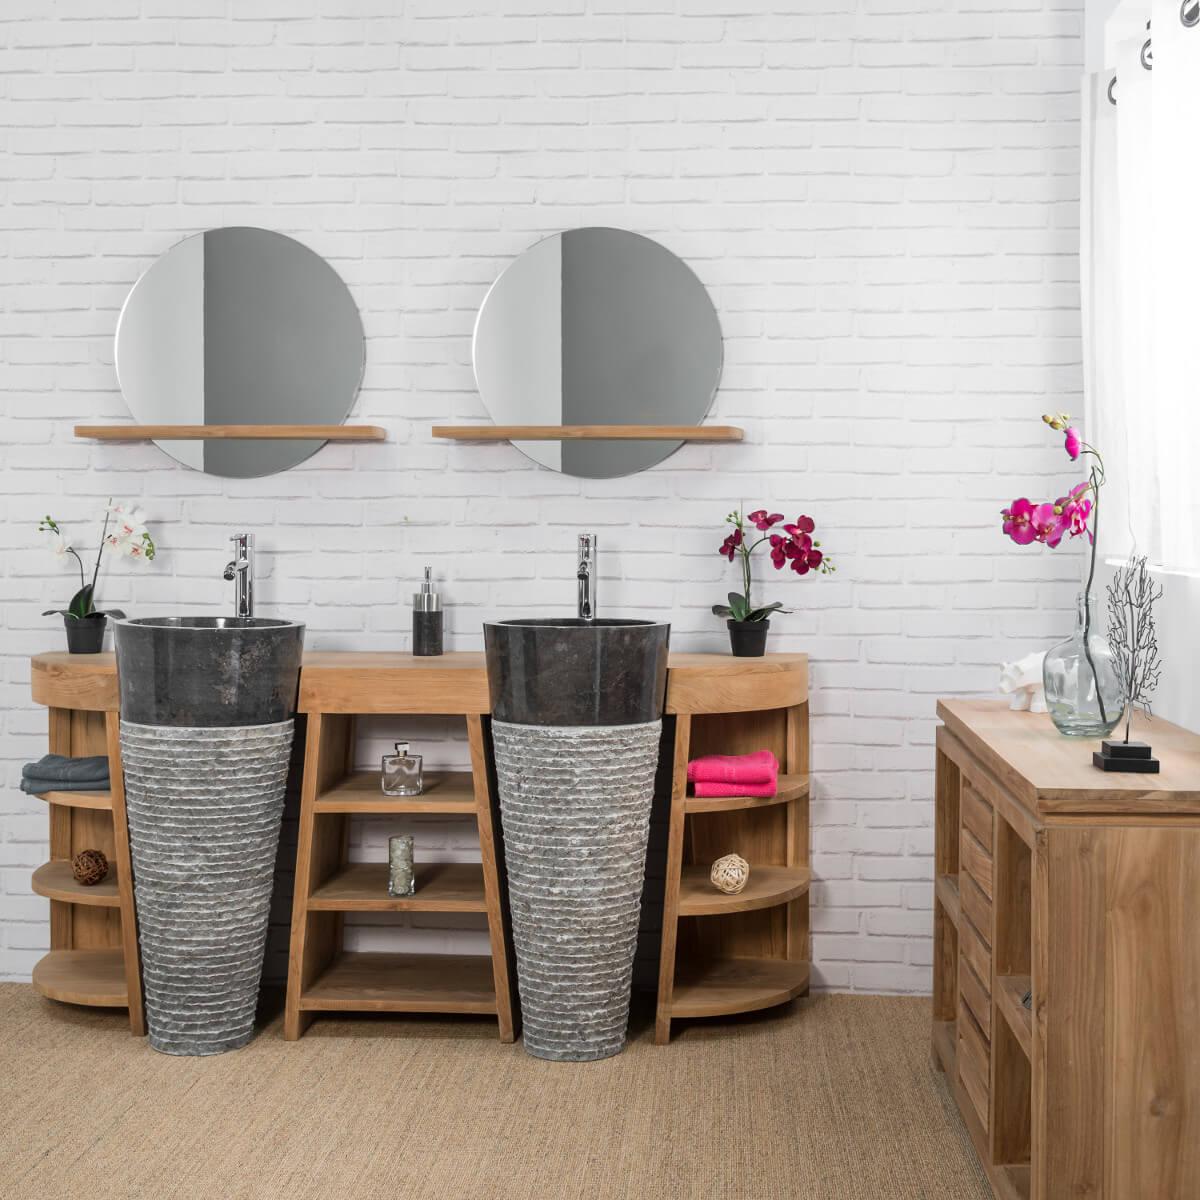 Miroir Salle De Bain 120 meuble sous vasque en teck massif 120 cm